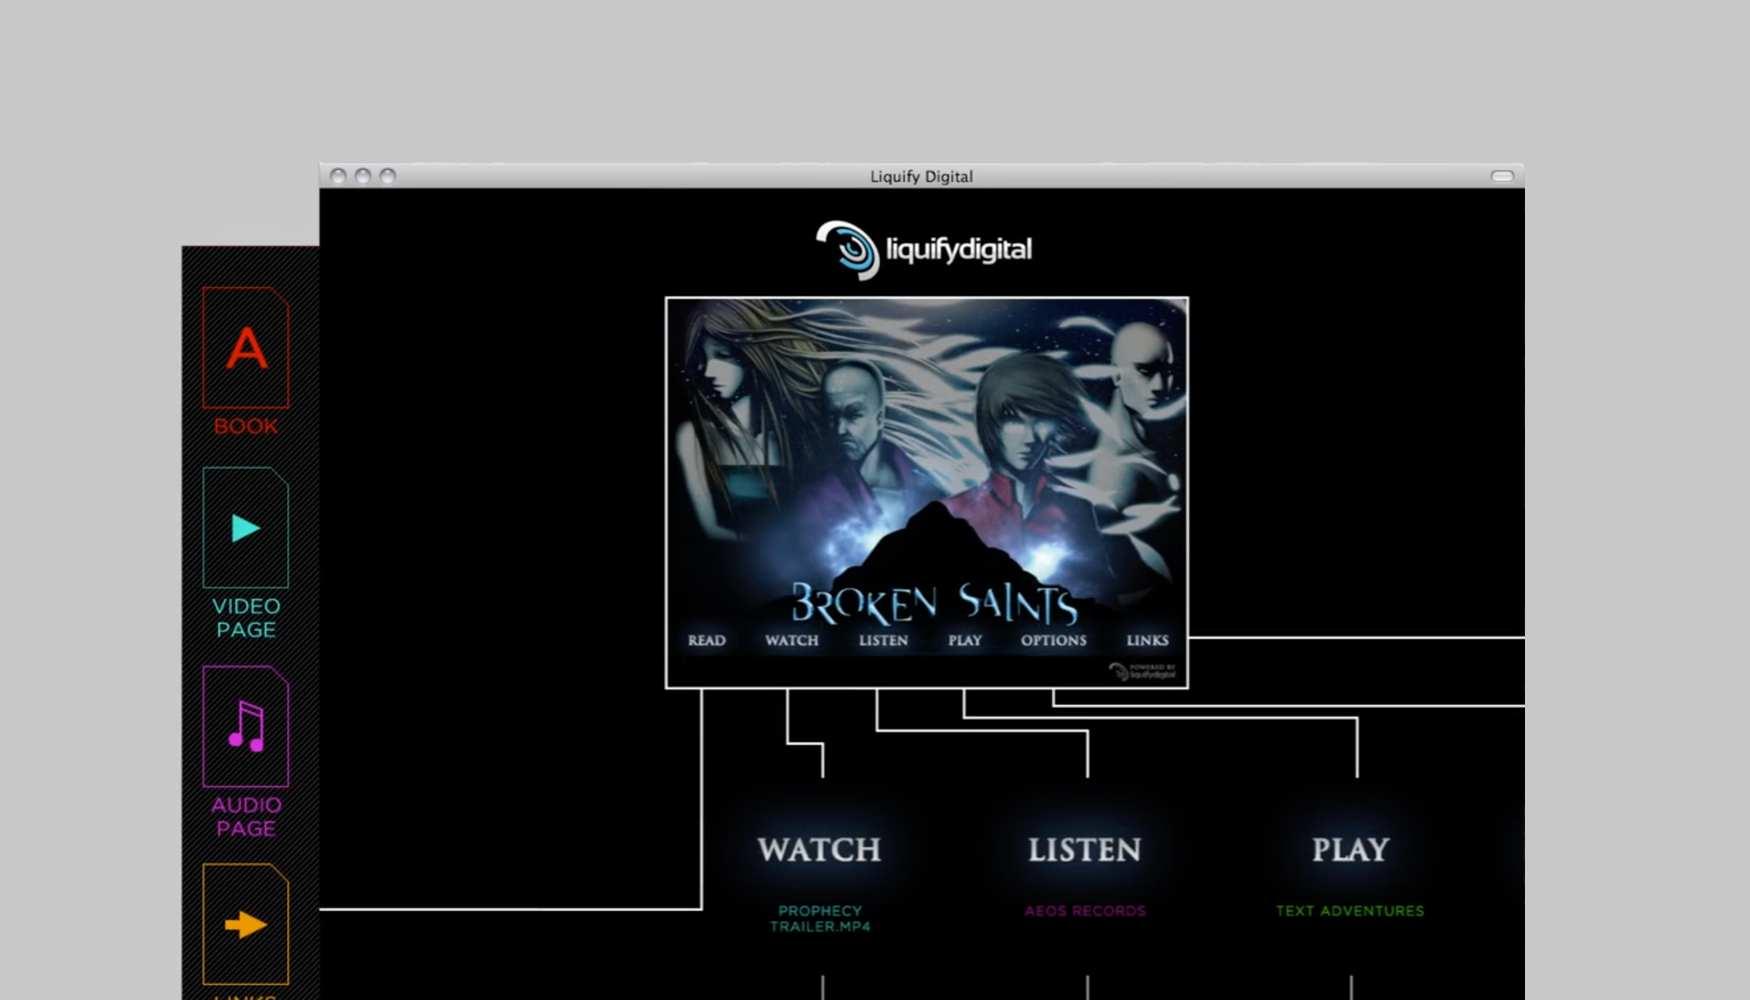 The main screen of the Liquify Digital app.